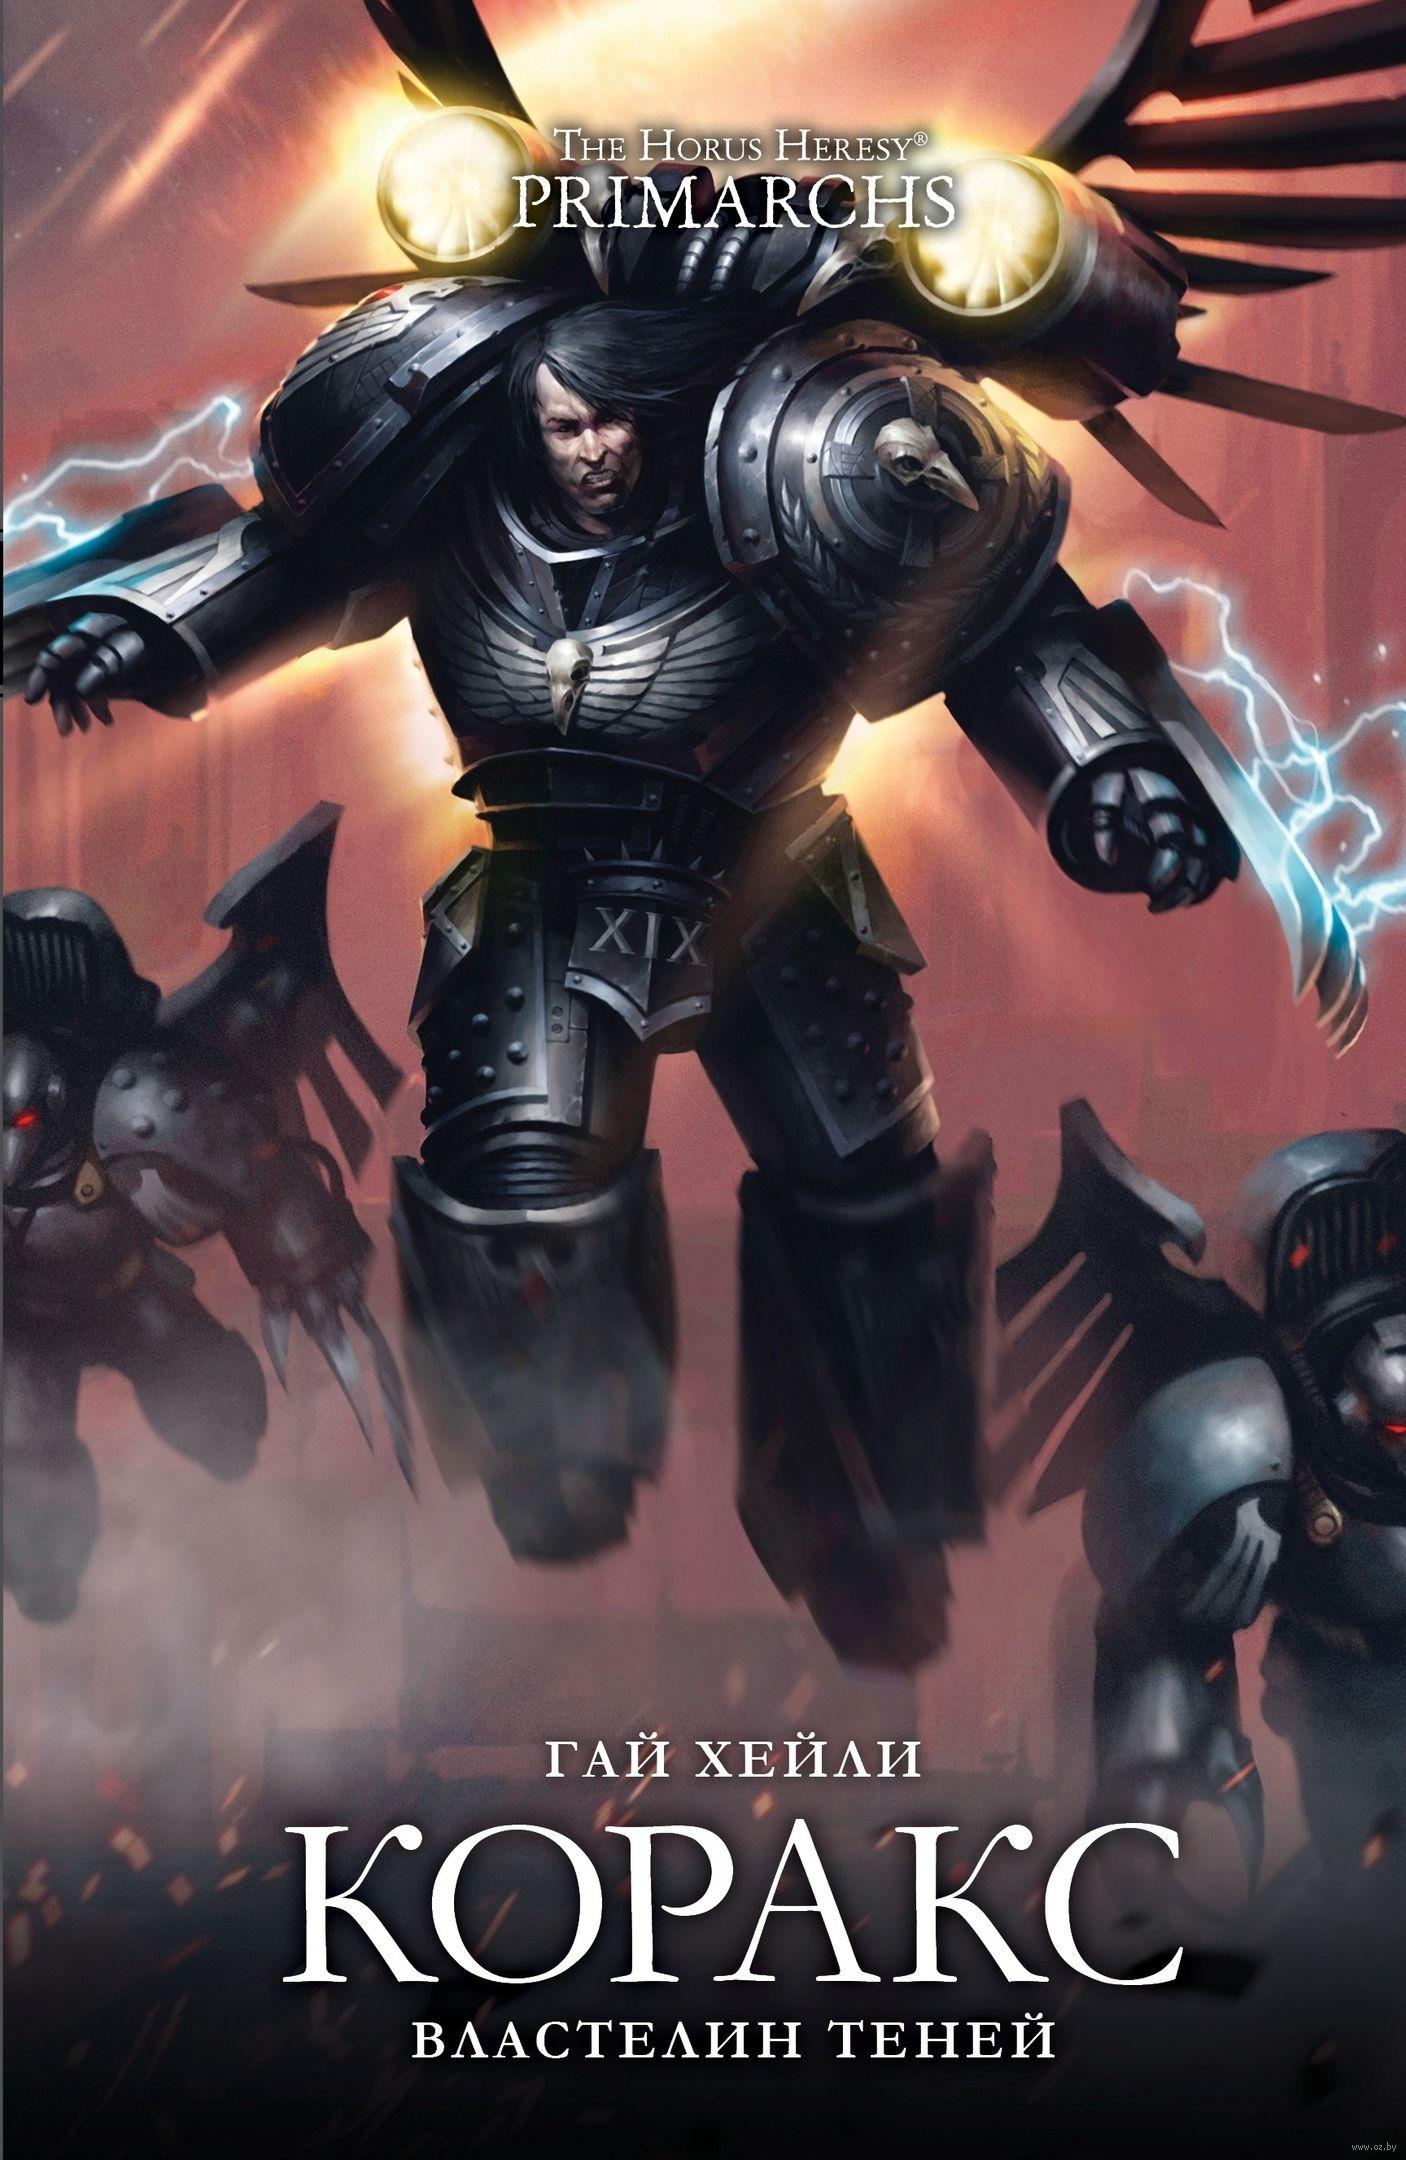 Книга на русском языке «Warhammer 40000. Коракс»